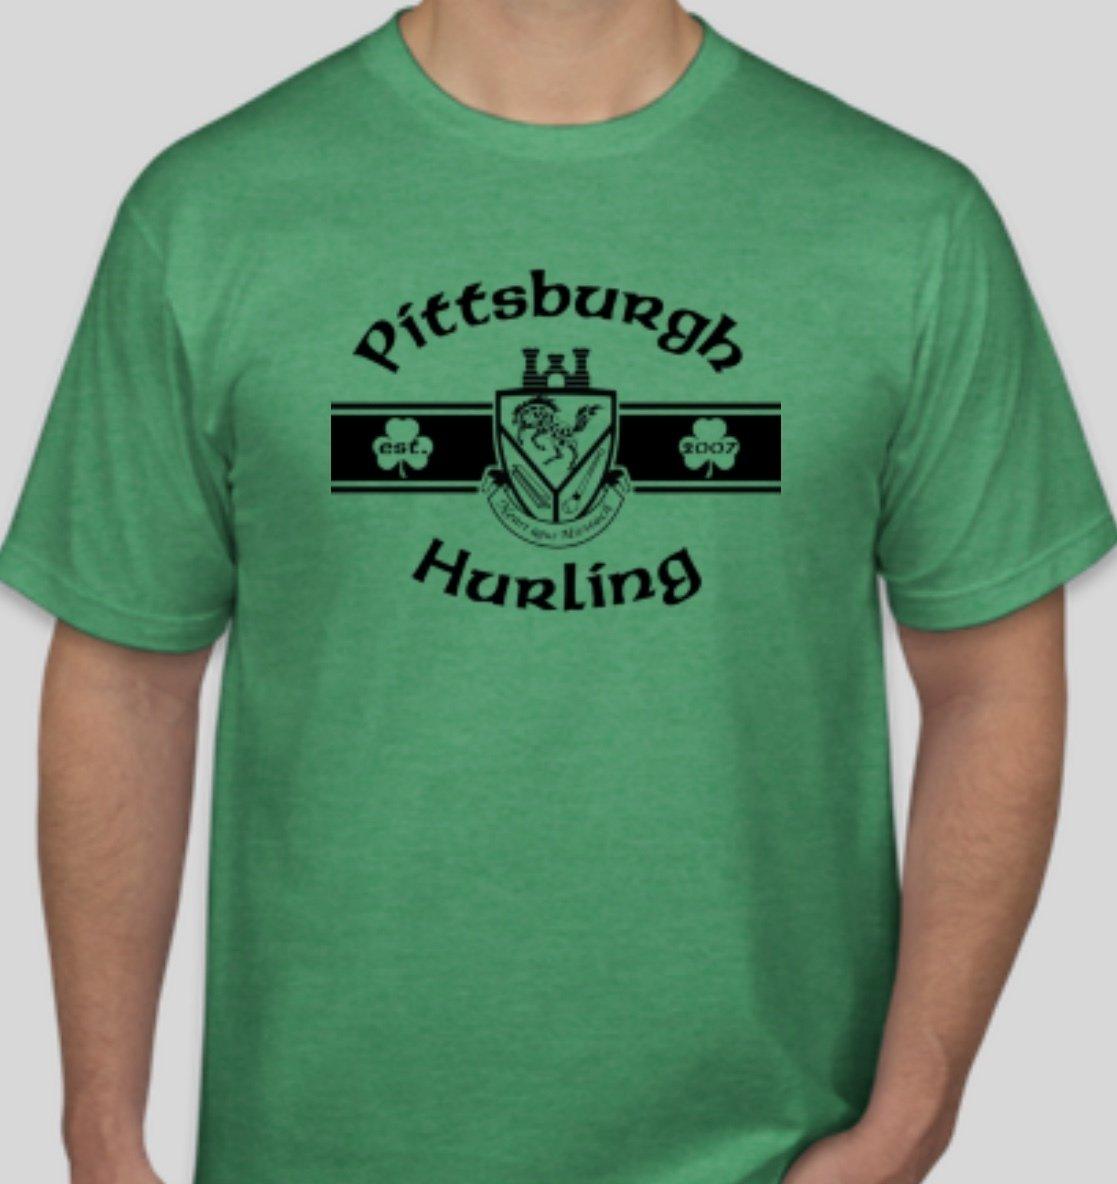 2018 Pittsburgh Hurling Shirt